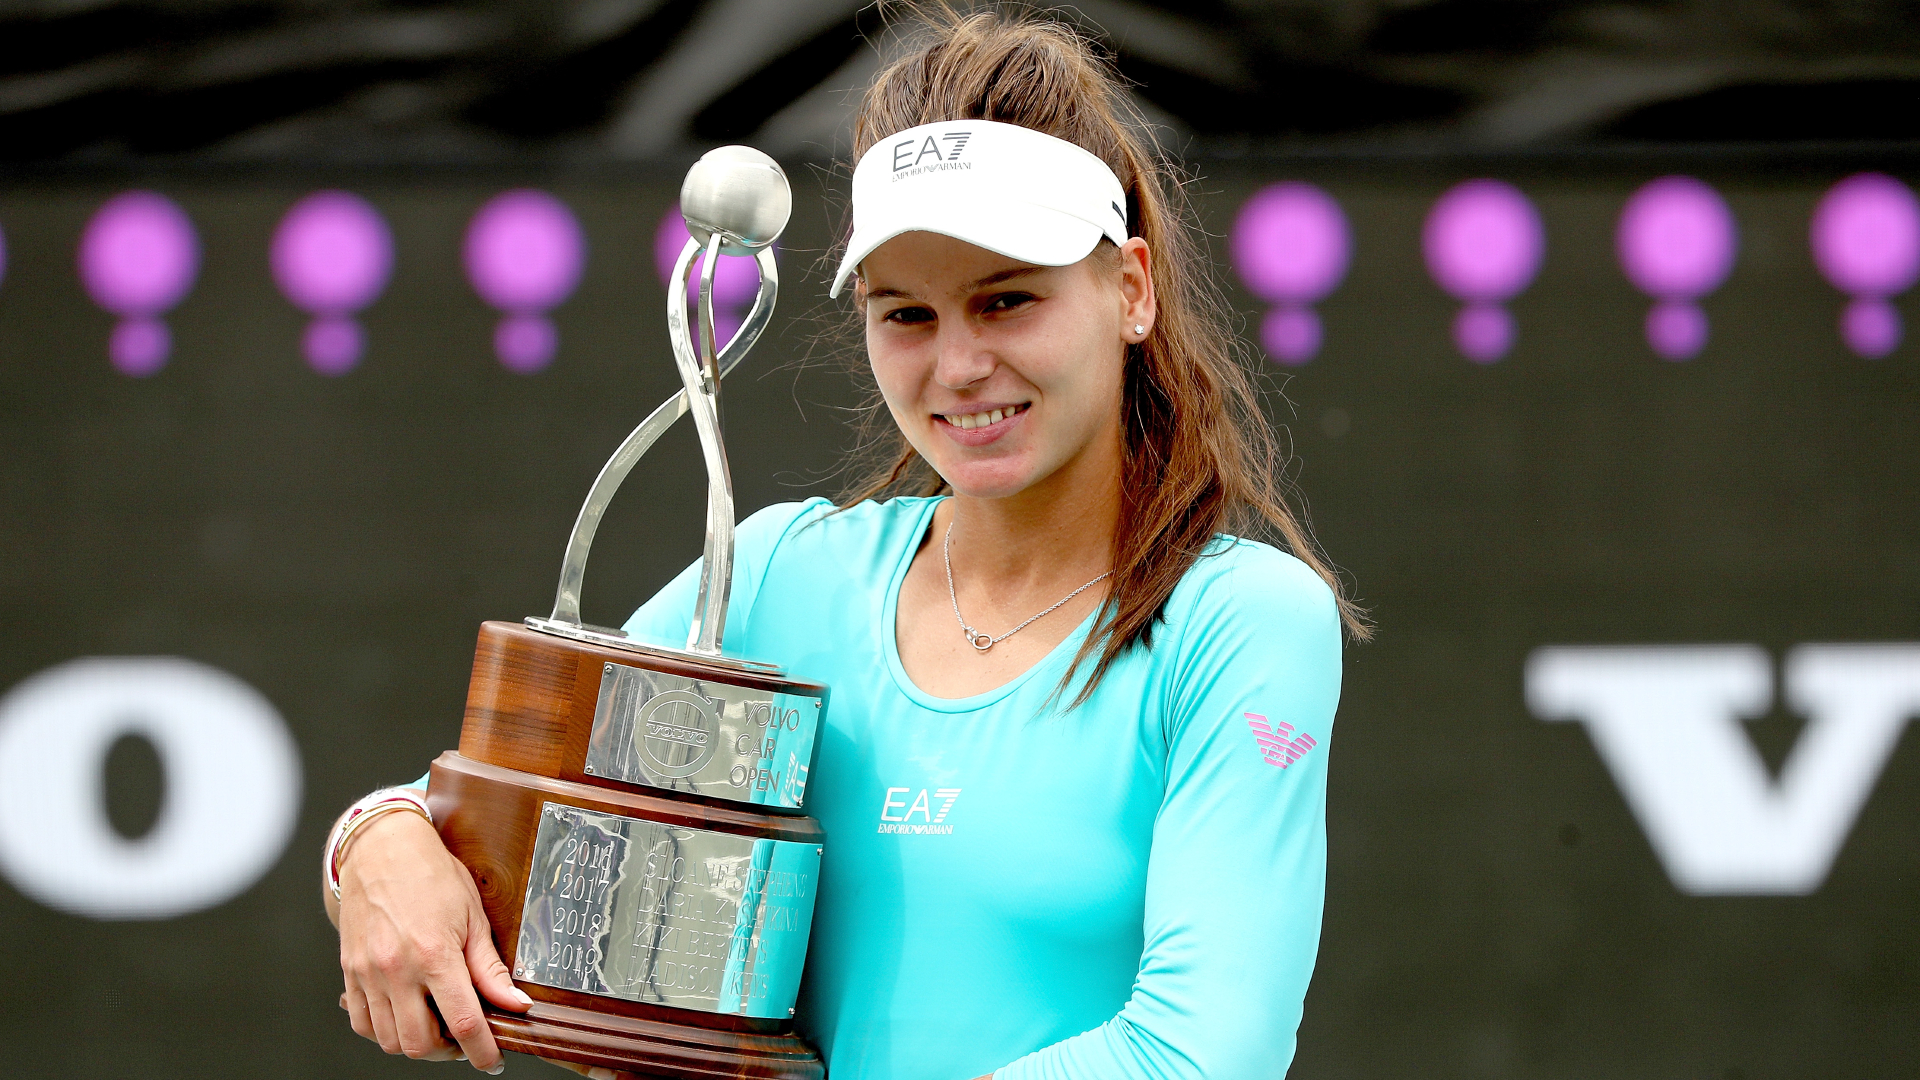 WTA breakthrough titles for Kudermetova and Osorio Serrano